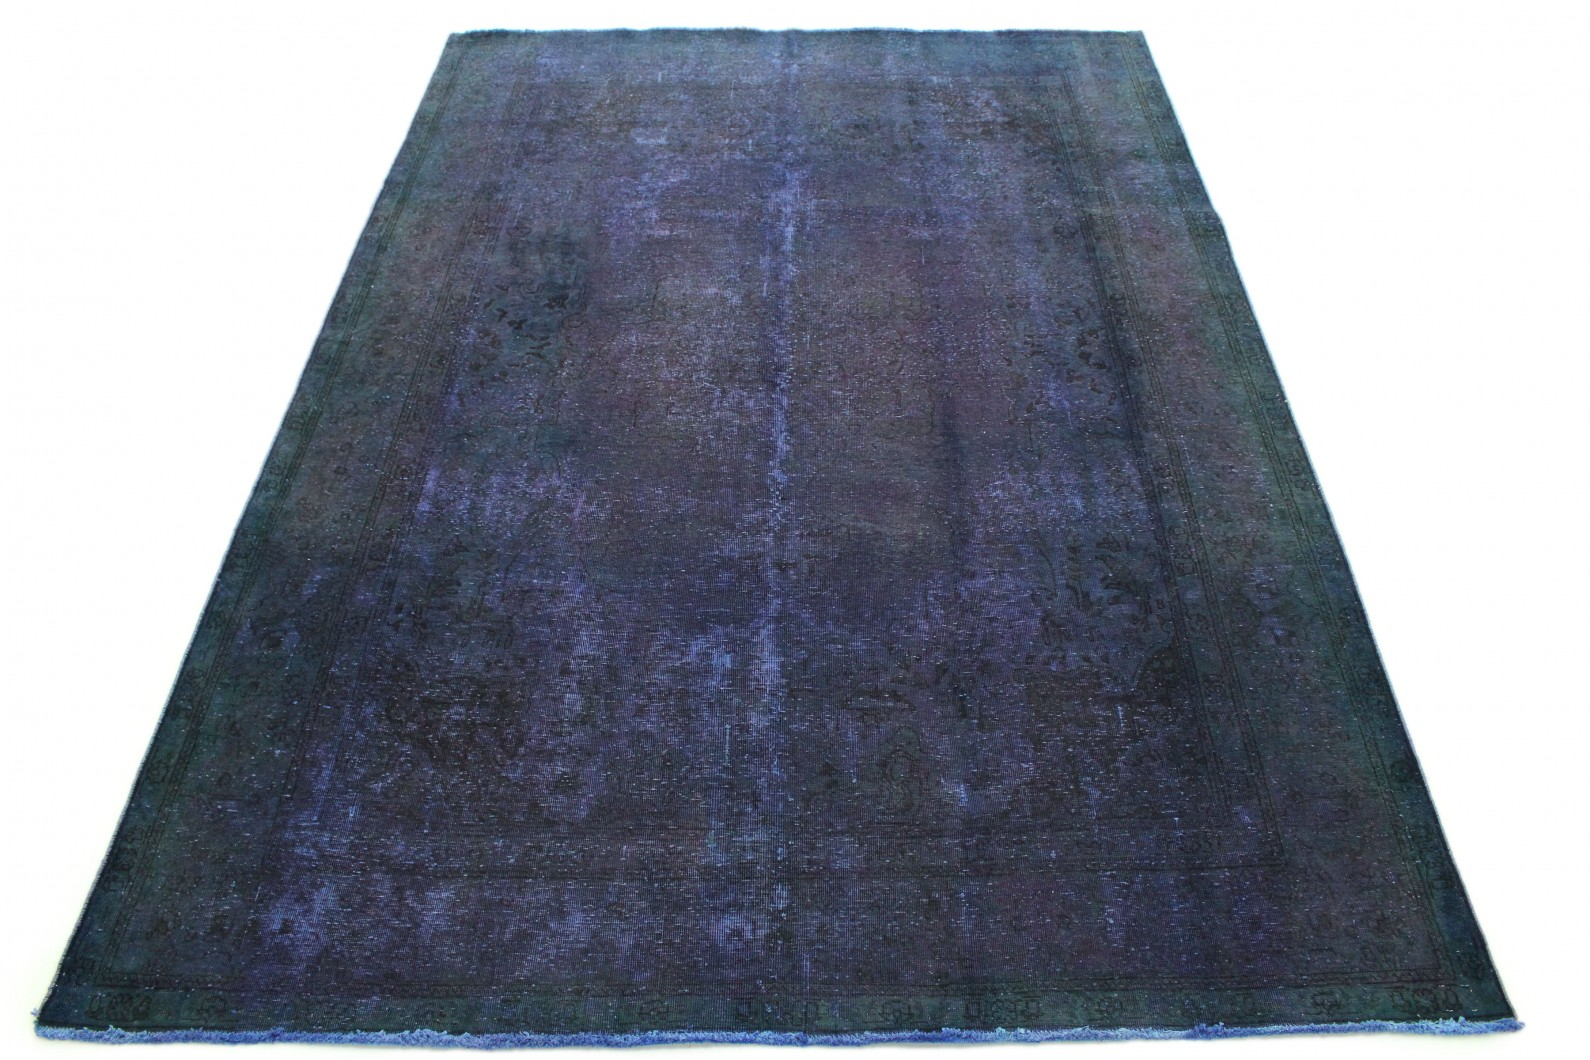 Carpetido Design Vintage-Teppich Lila Blau Grün in 350x250 (1 / 7)